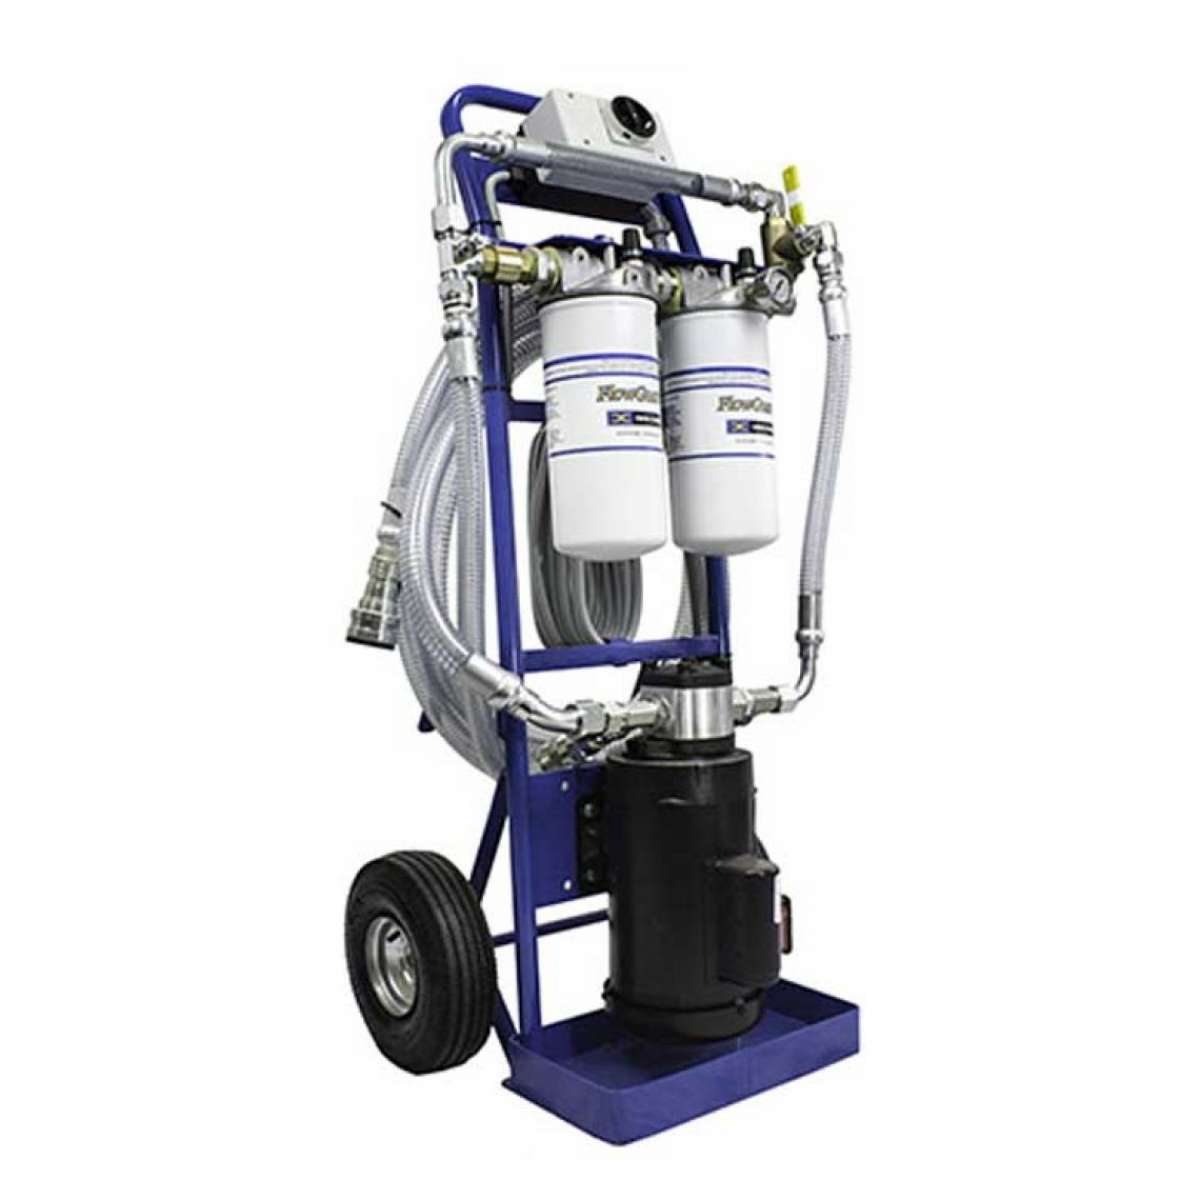 Flowgard Filtercart - 2 gpm pump 1 hp electric motor 115 vac 60 hz 1725 rpms 13 amps